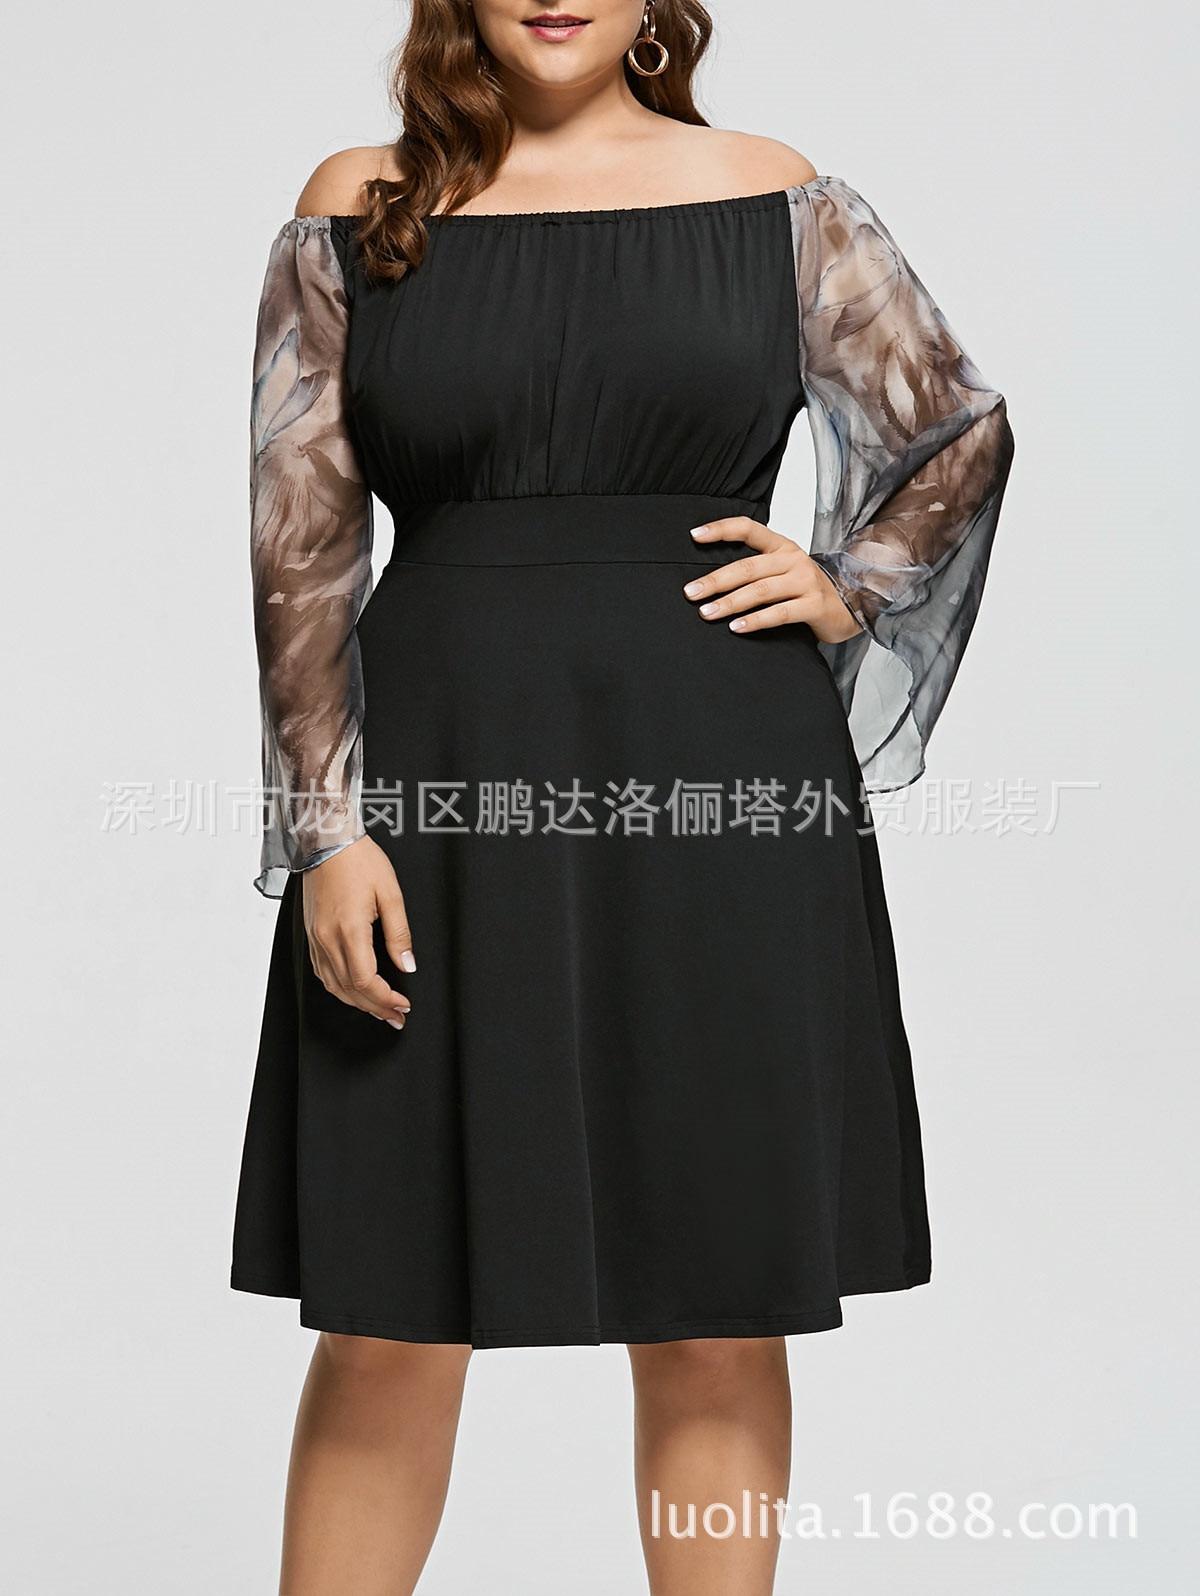 Long Sleeve Autumn Winter Cocktail Dresses Elegant...